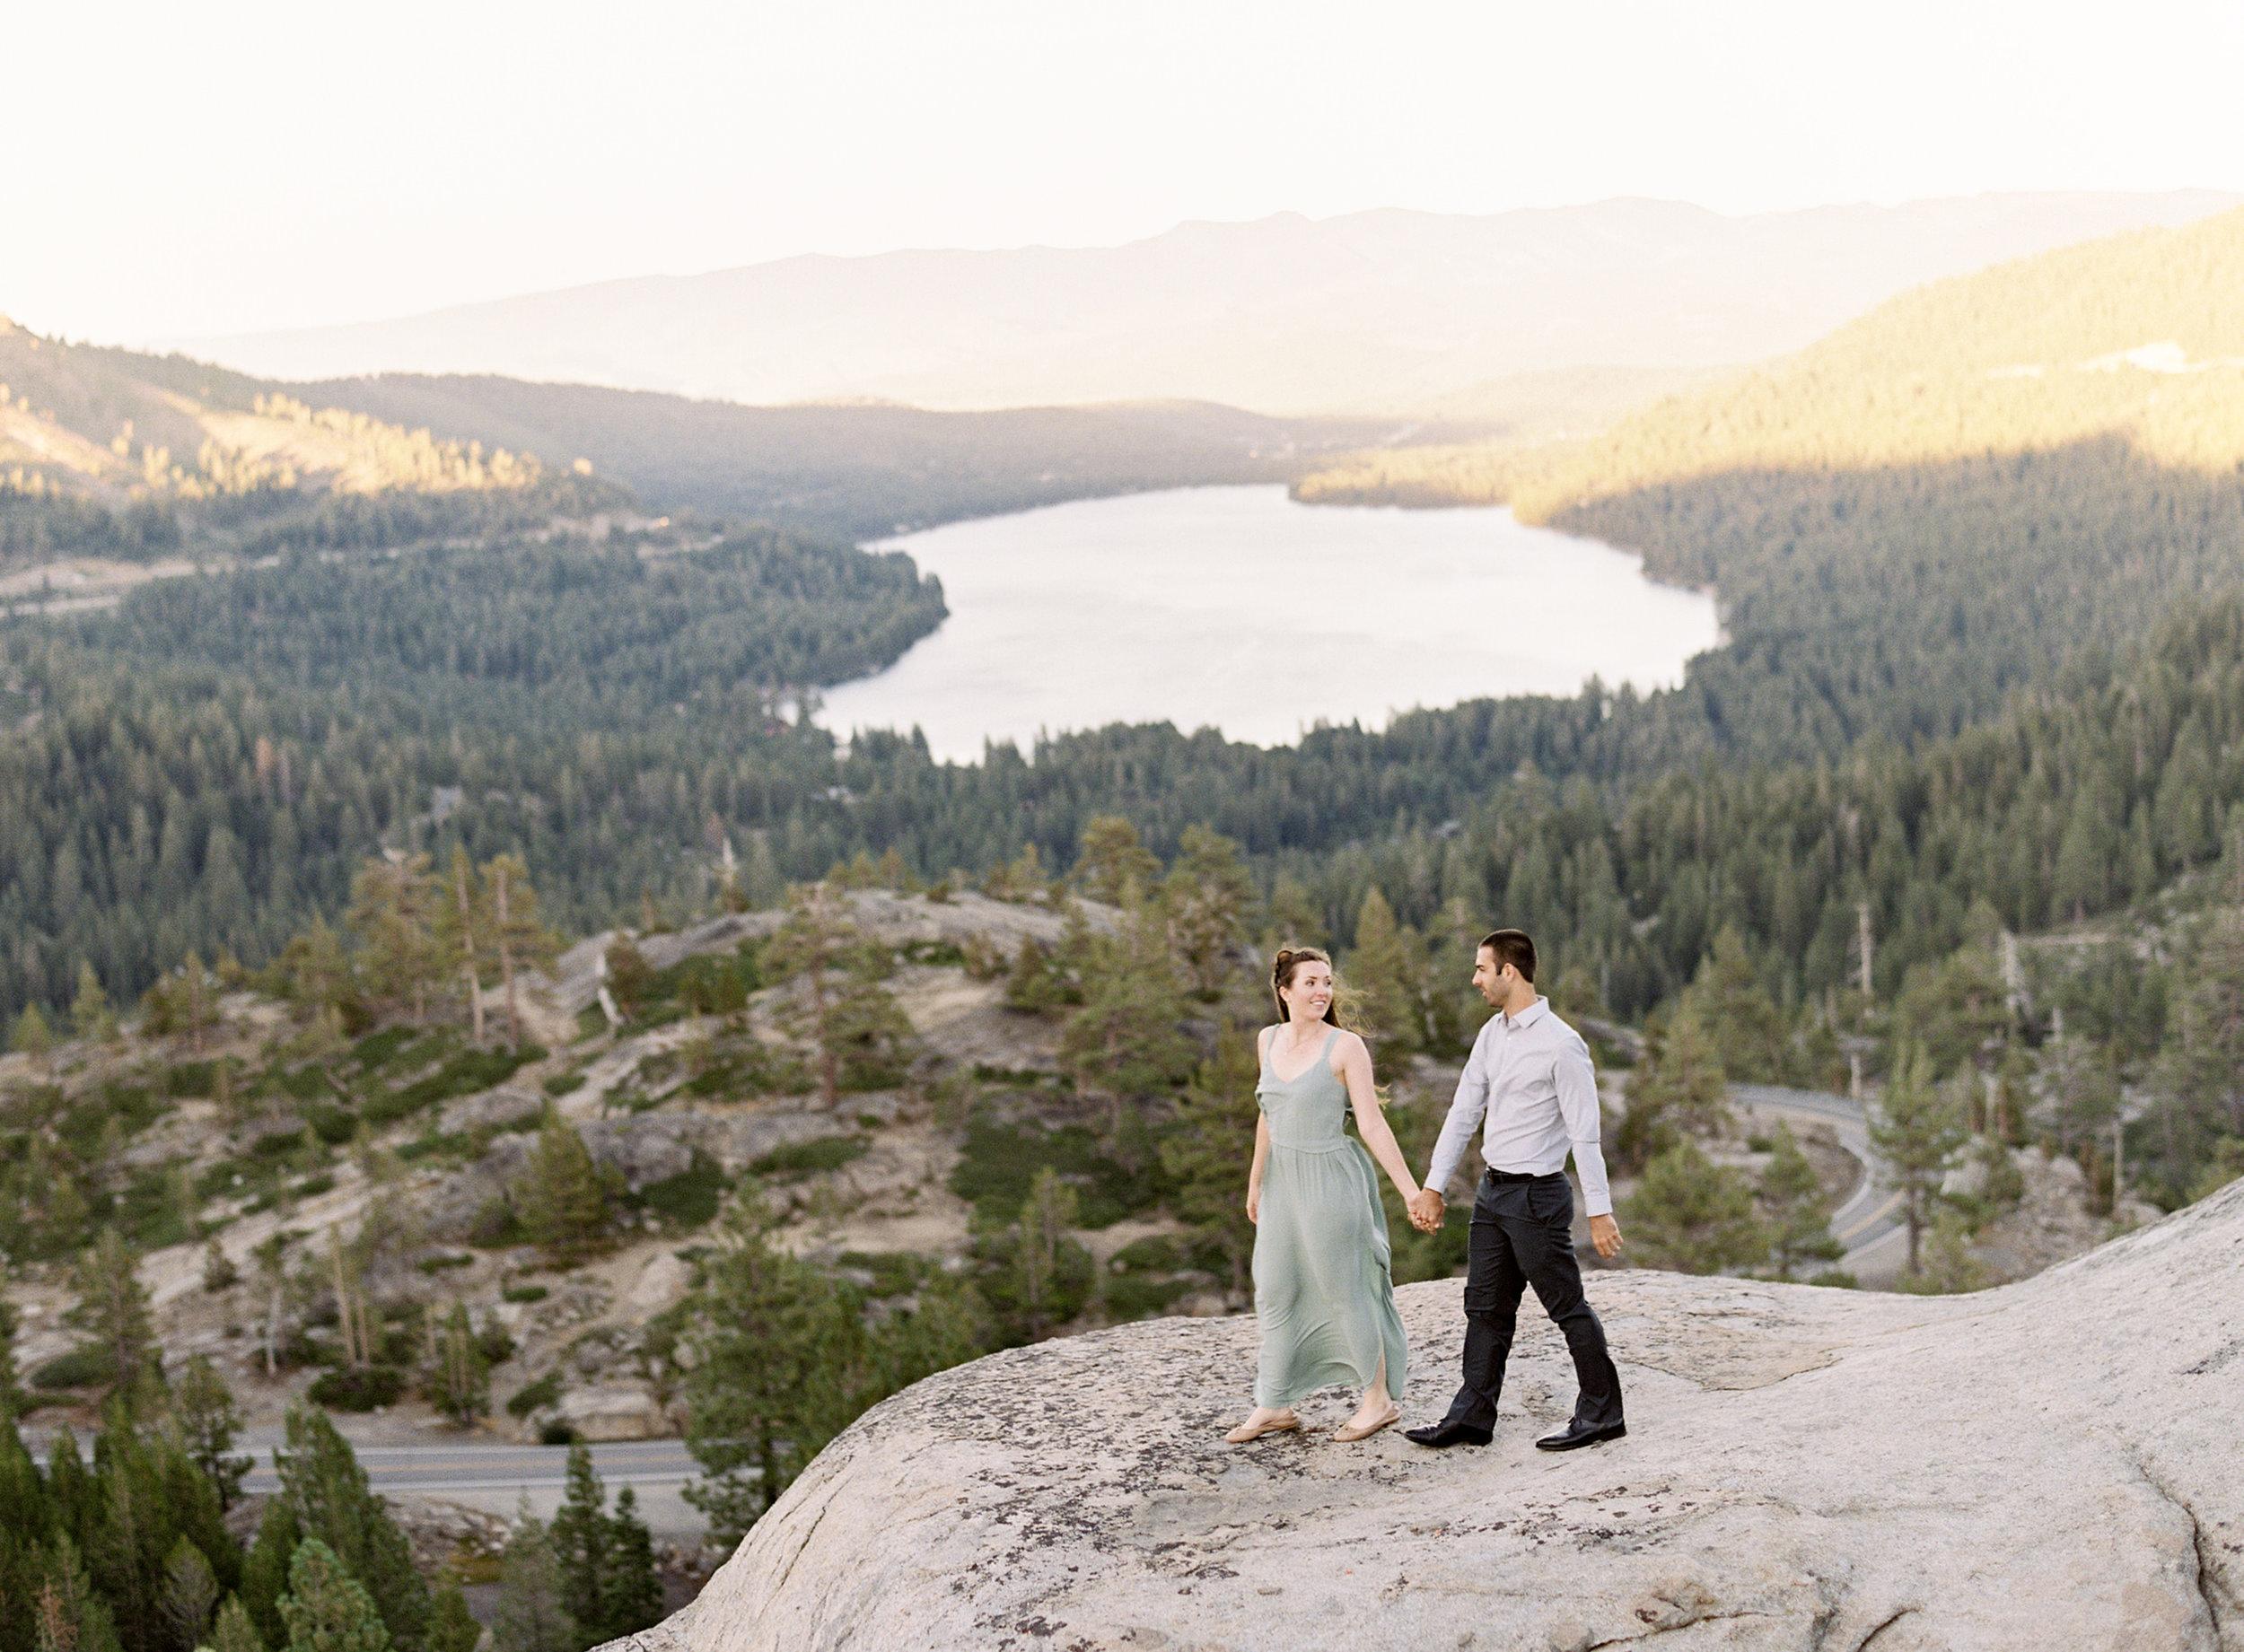 donner-lake-summit-engagement-photography-1-13.jpg